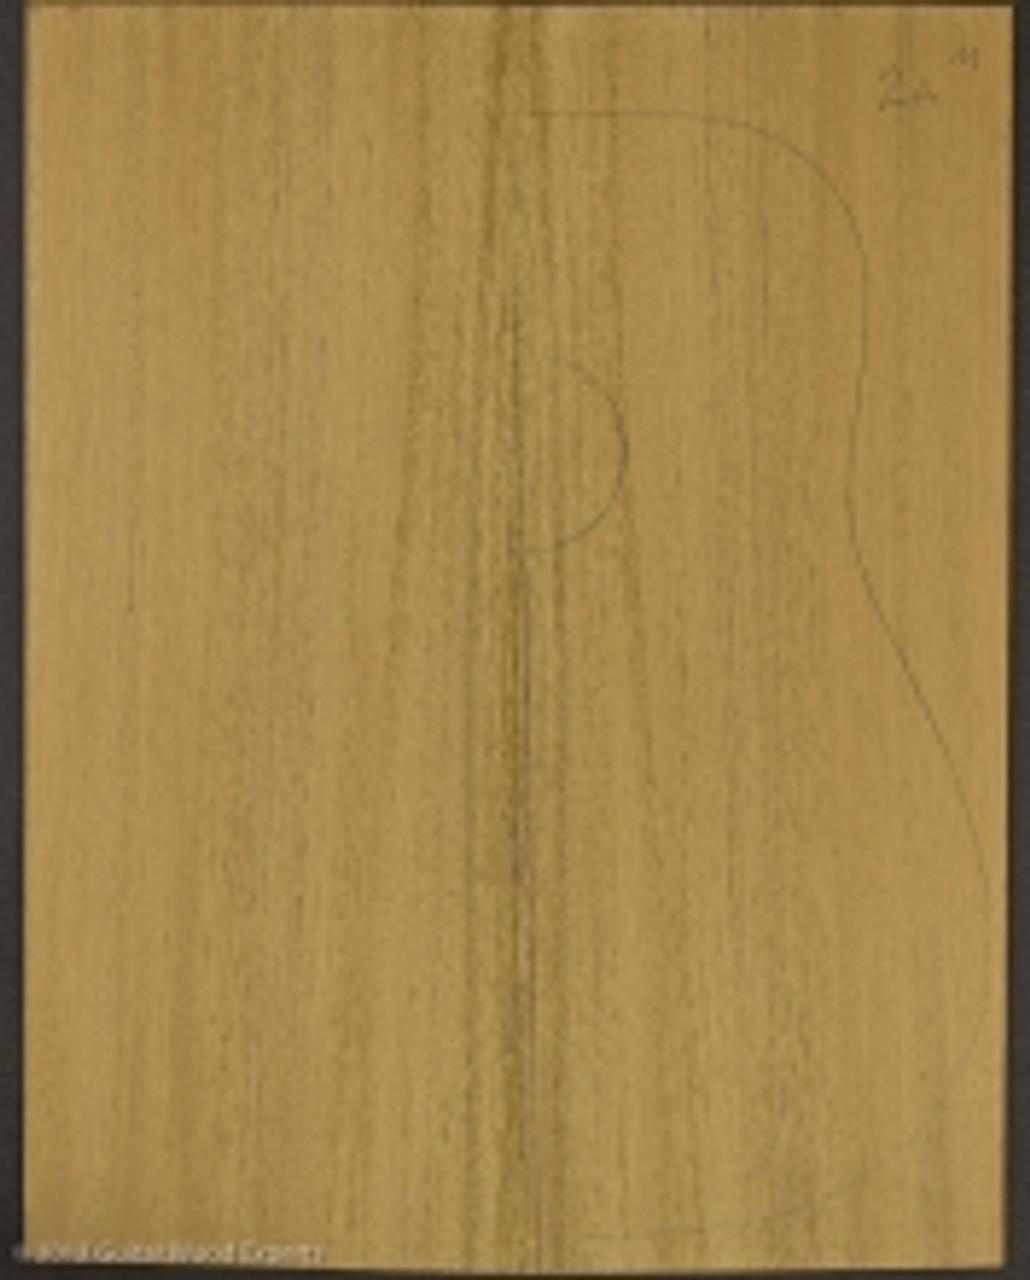 2A Genuine Mahogany Sound Board